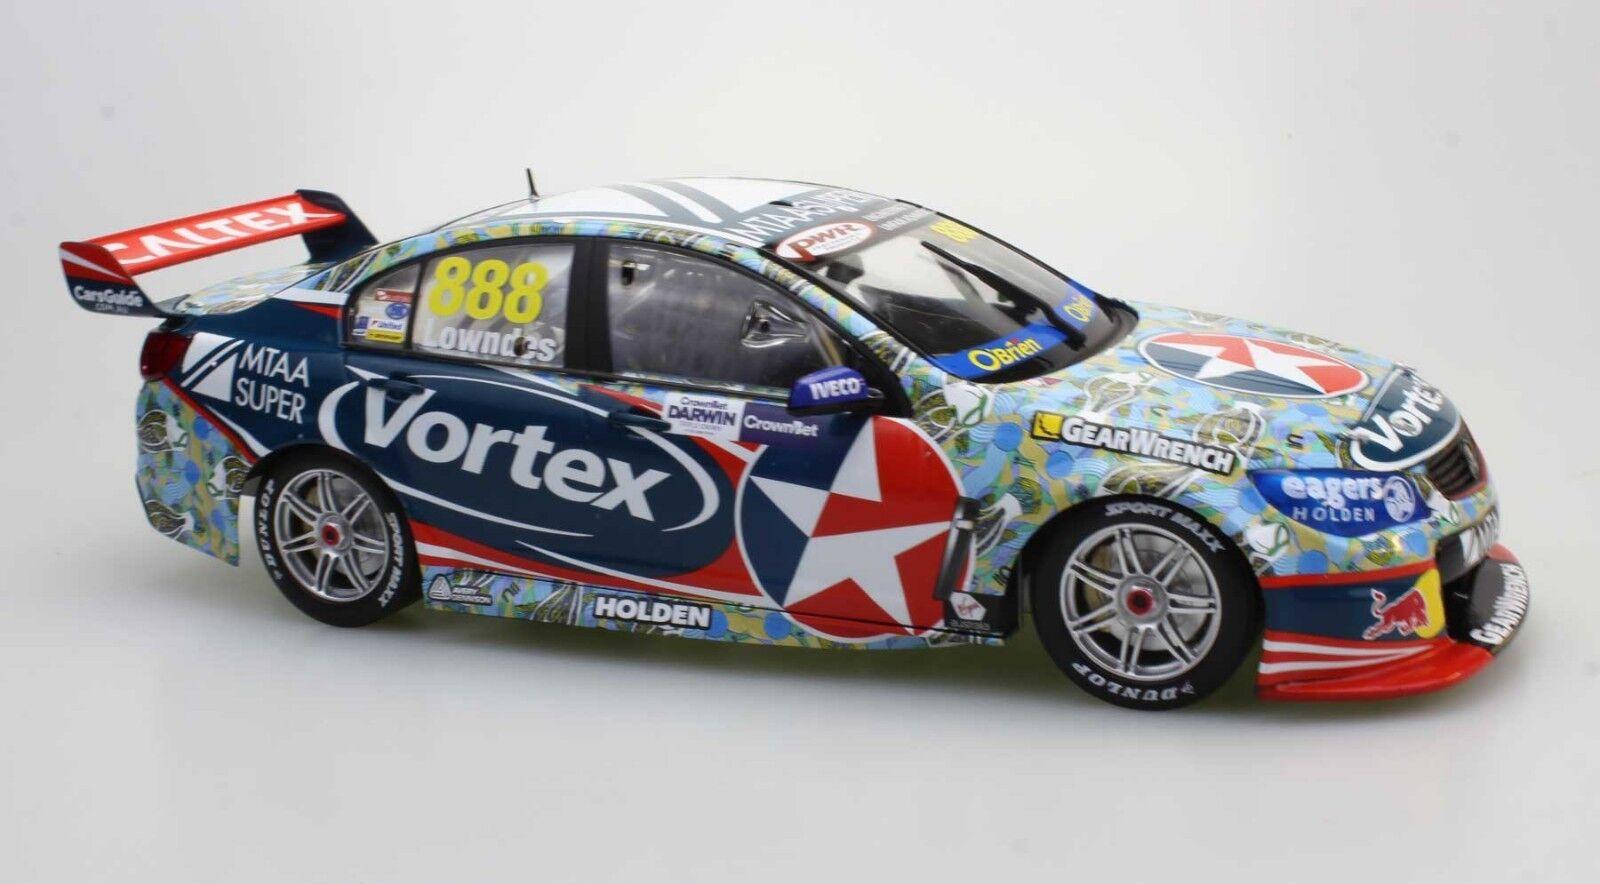 New Craig Lowndes 1 18 2016 Darwin Livery V8 Supercar Vortex Holden VF Commodore